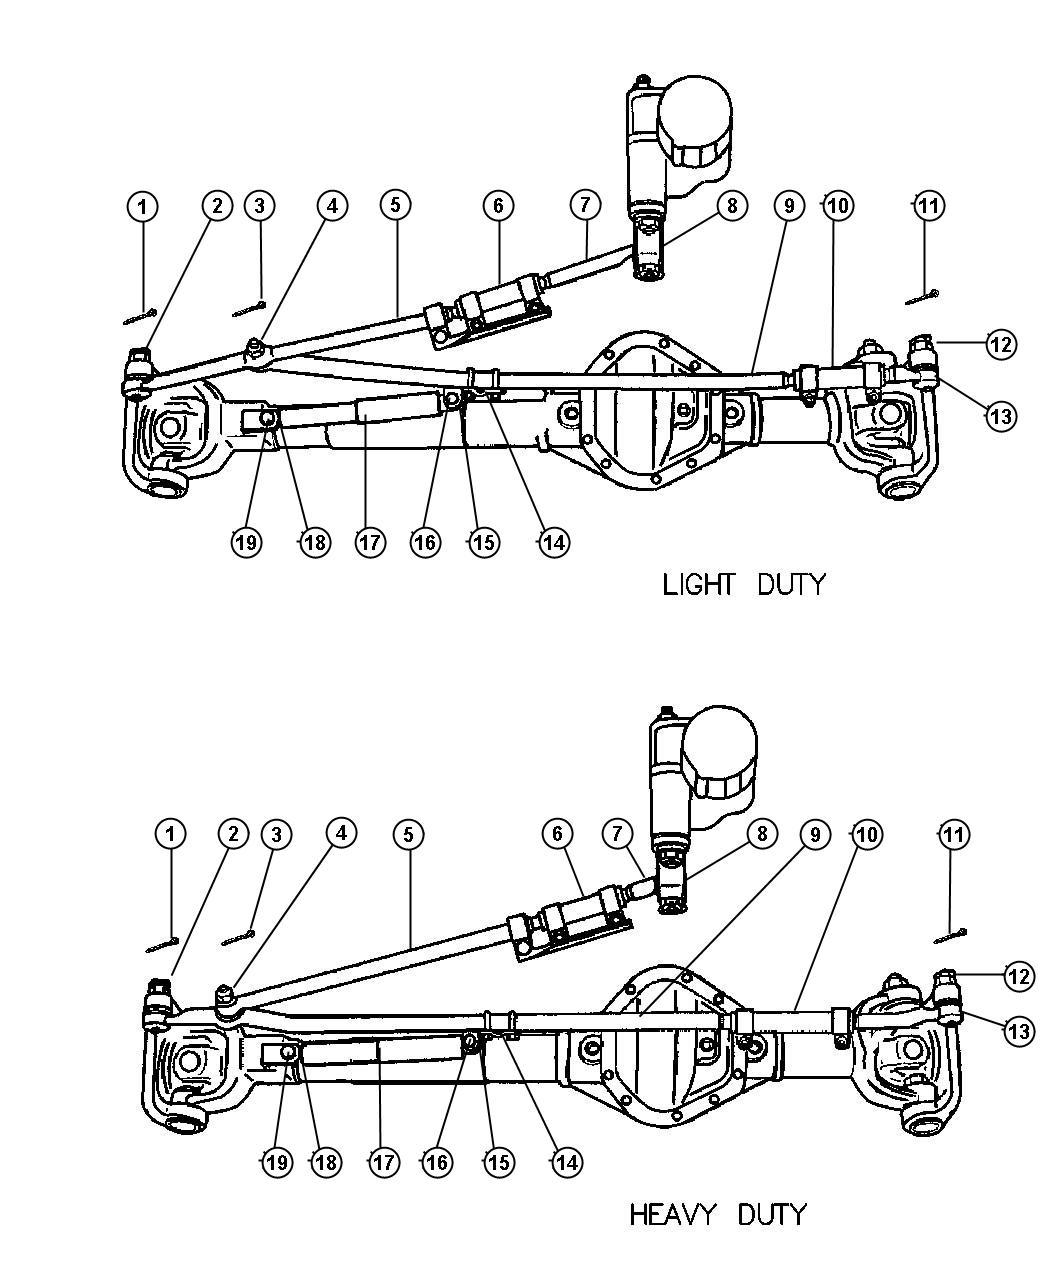 1999 dodge ram 1500 front axle diagram 351 windsor wiring suspension nitro